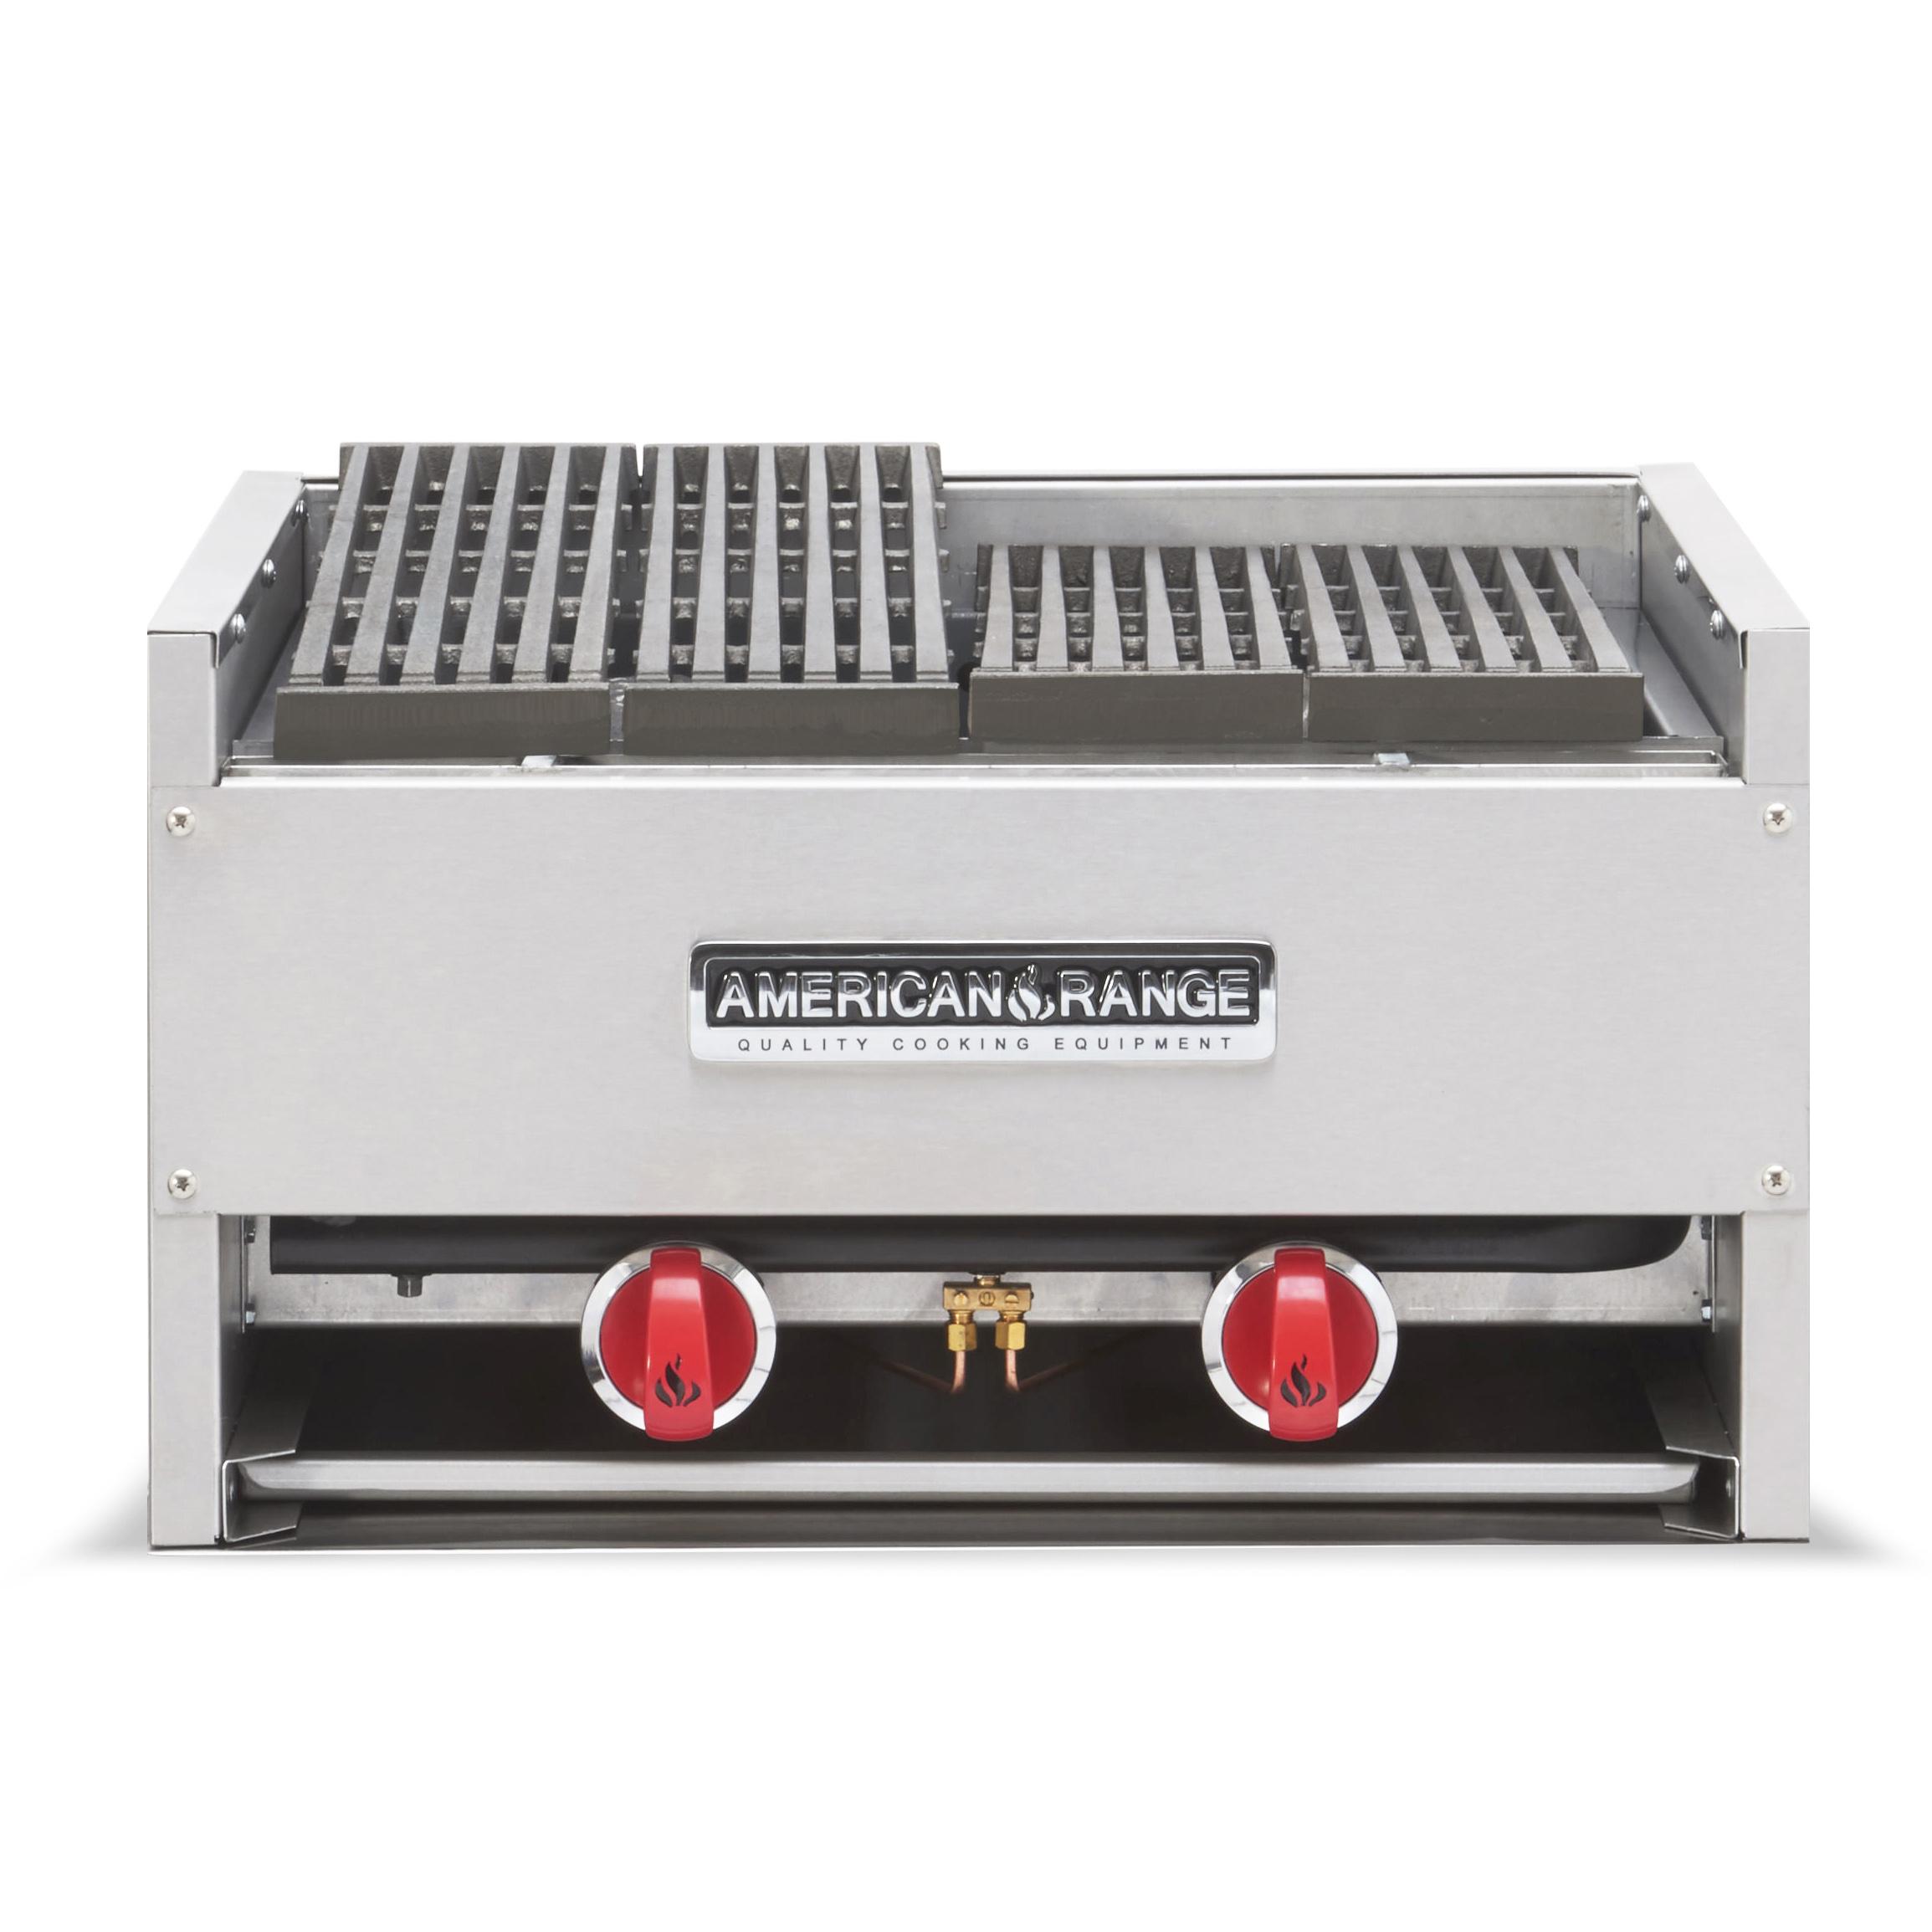 American Range AECB-48 charbroiler, gas, countertop